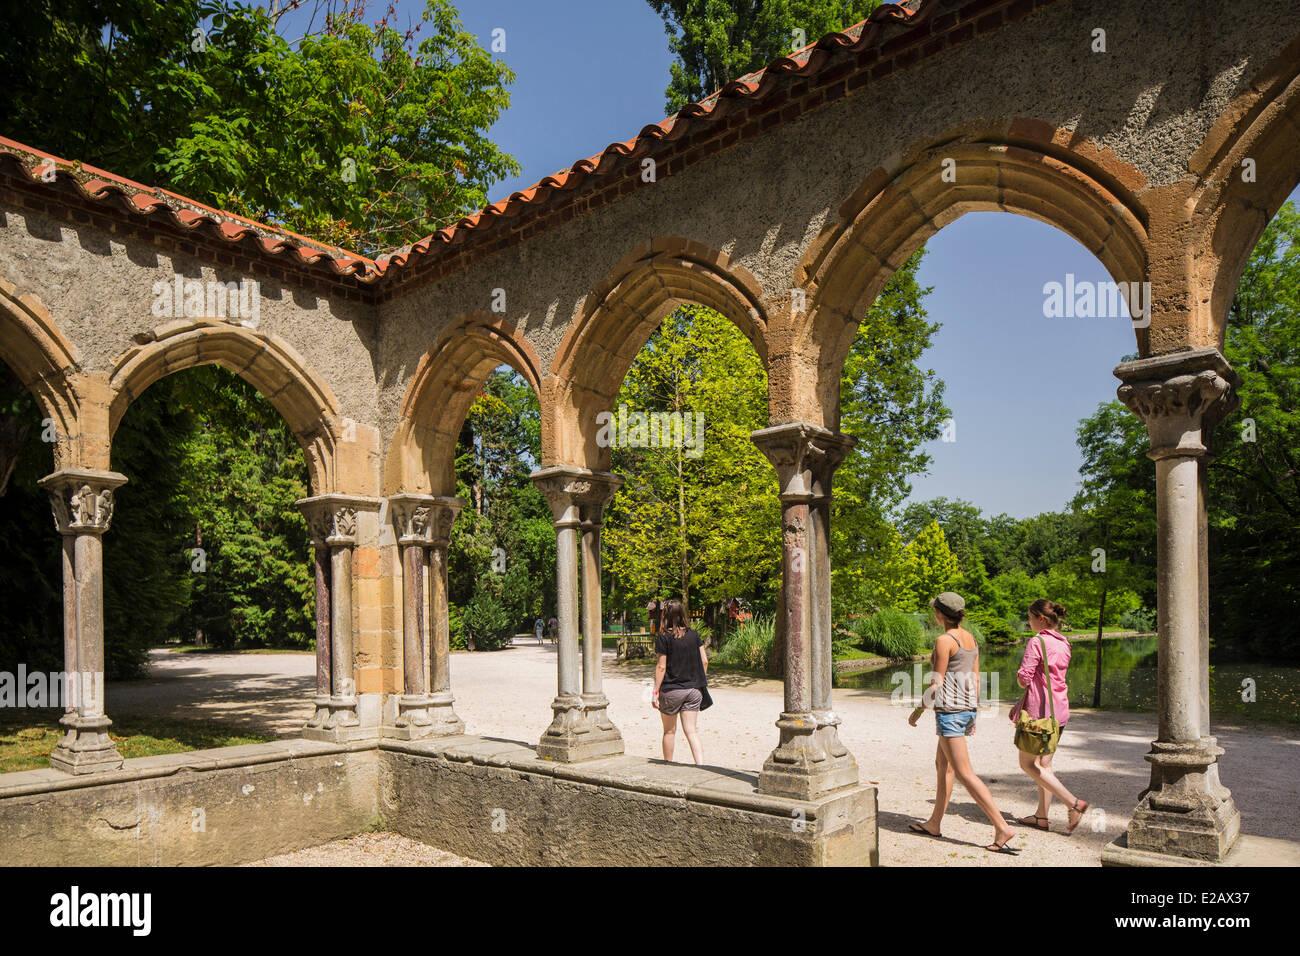 France, Hautes Pyrenees, Tarbes, cloister of Massey Garden - Stock Image